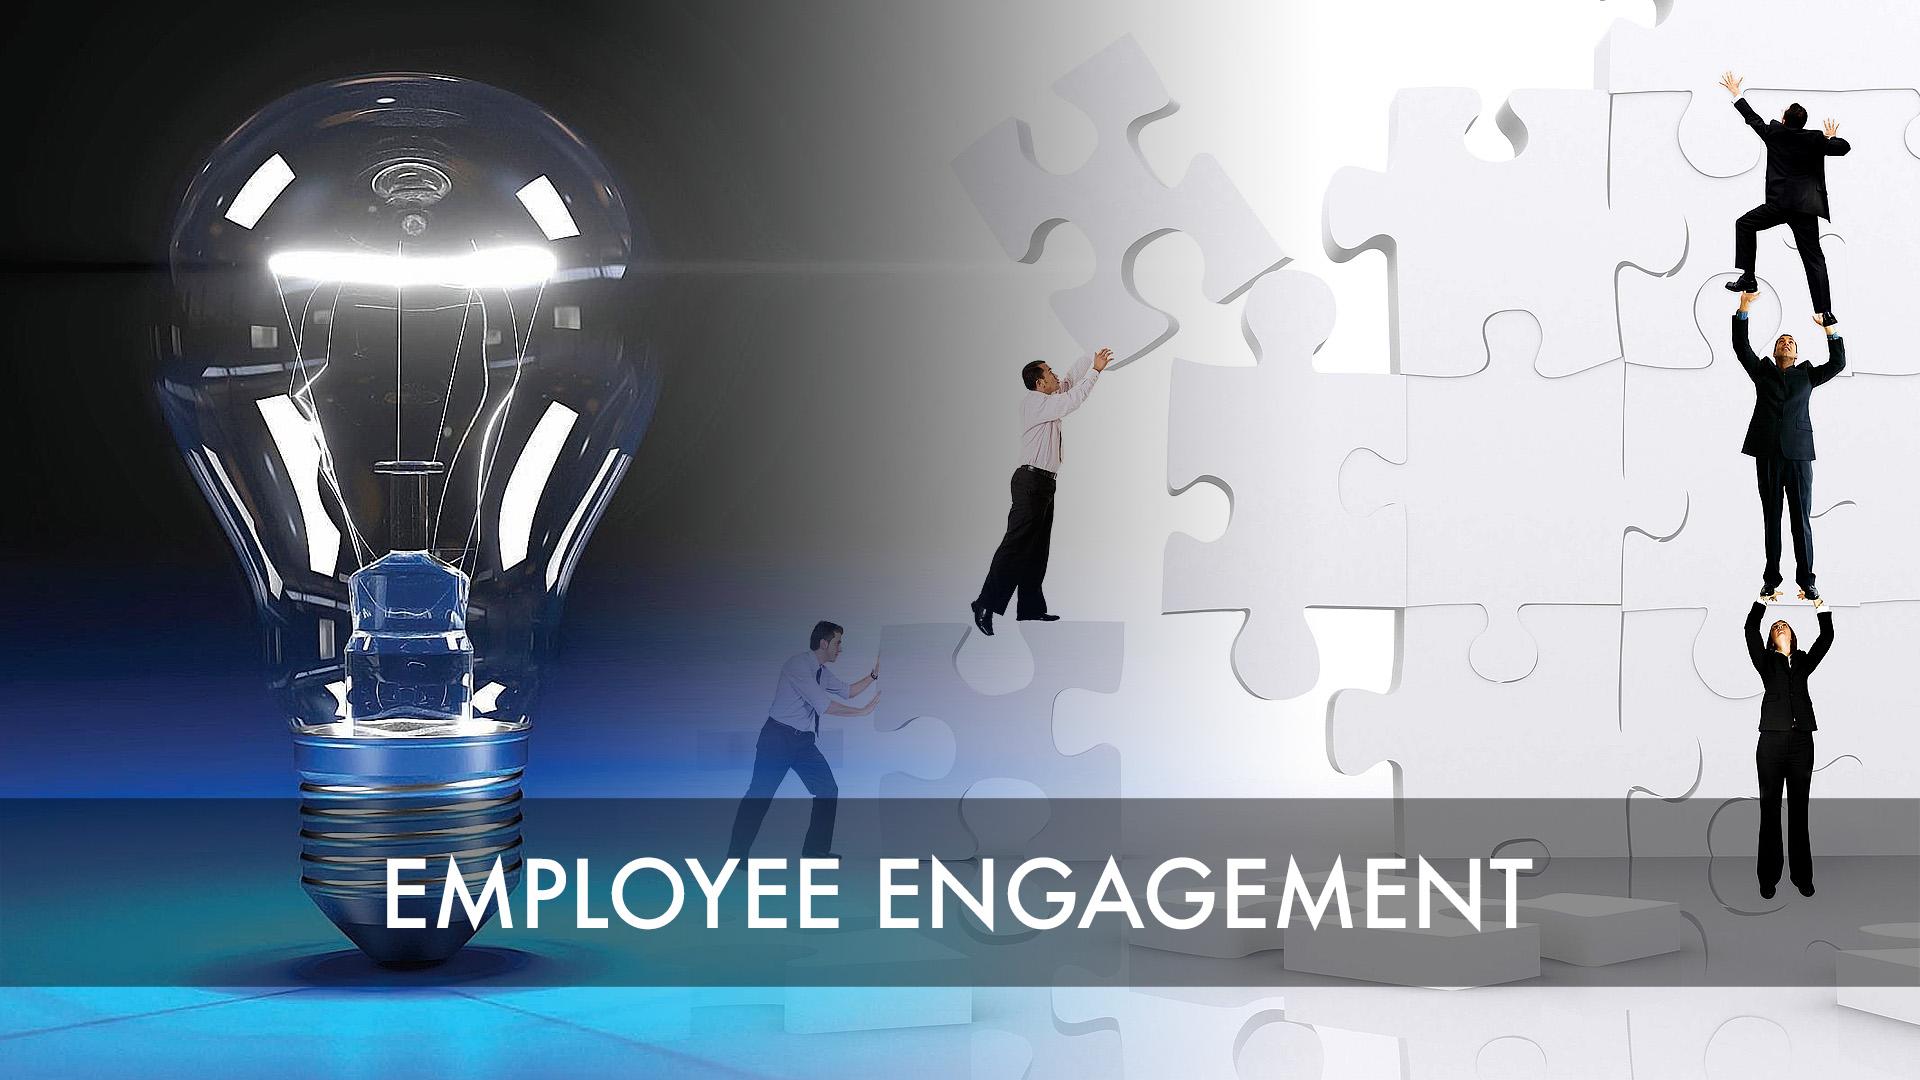 Employee Engagement Thumbnail copy.jpg